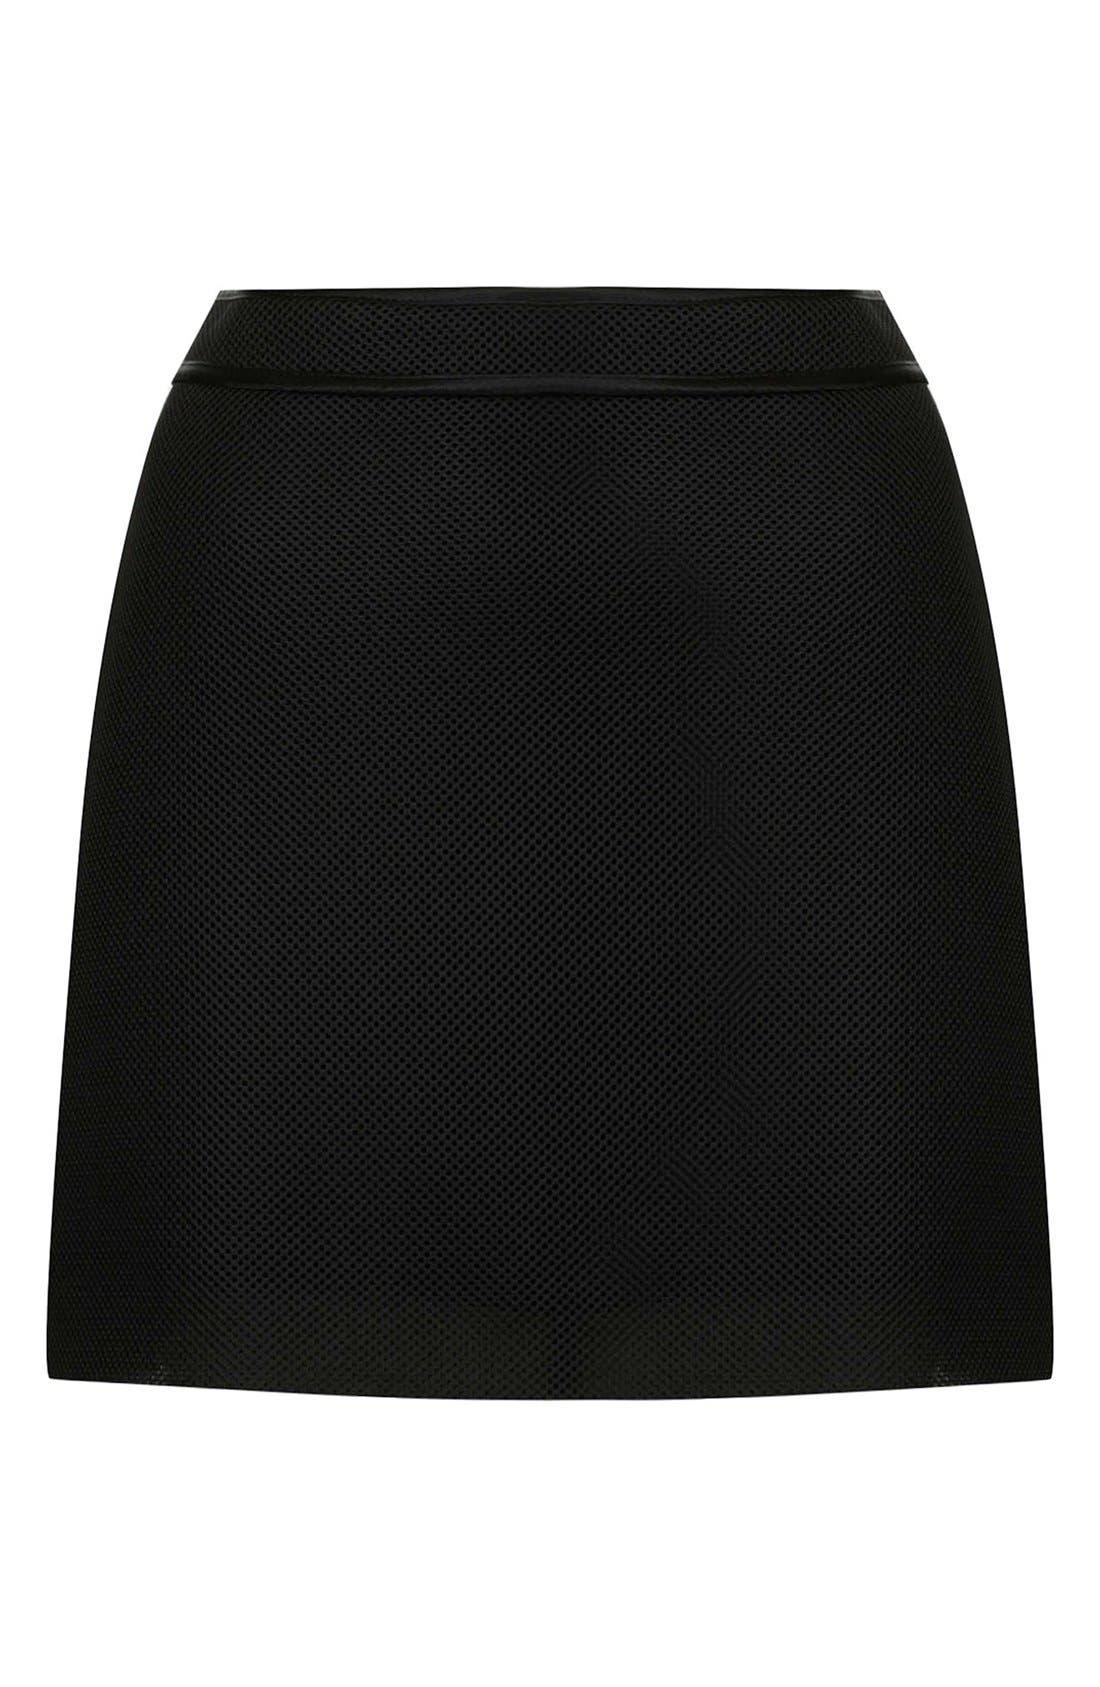 Airtex Miniskirt,                             Alternate thumbnail 5, color,